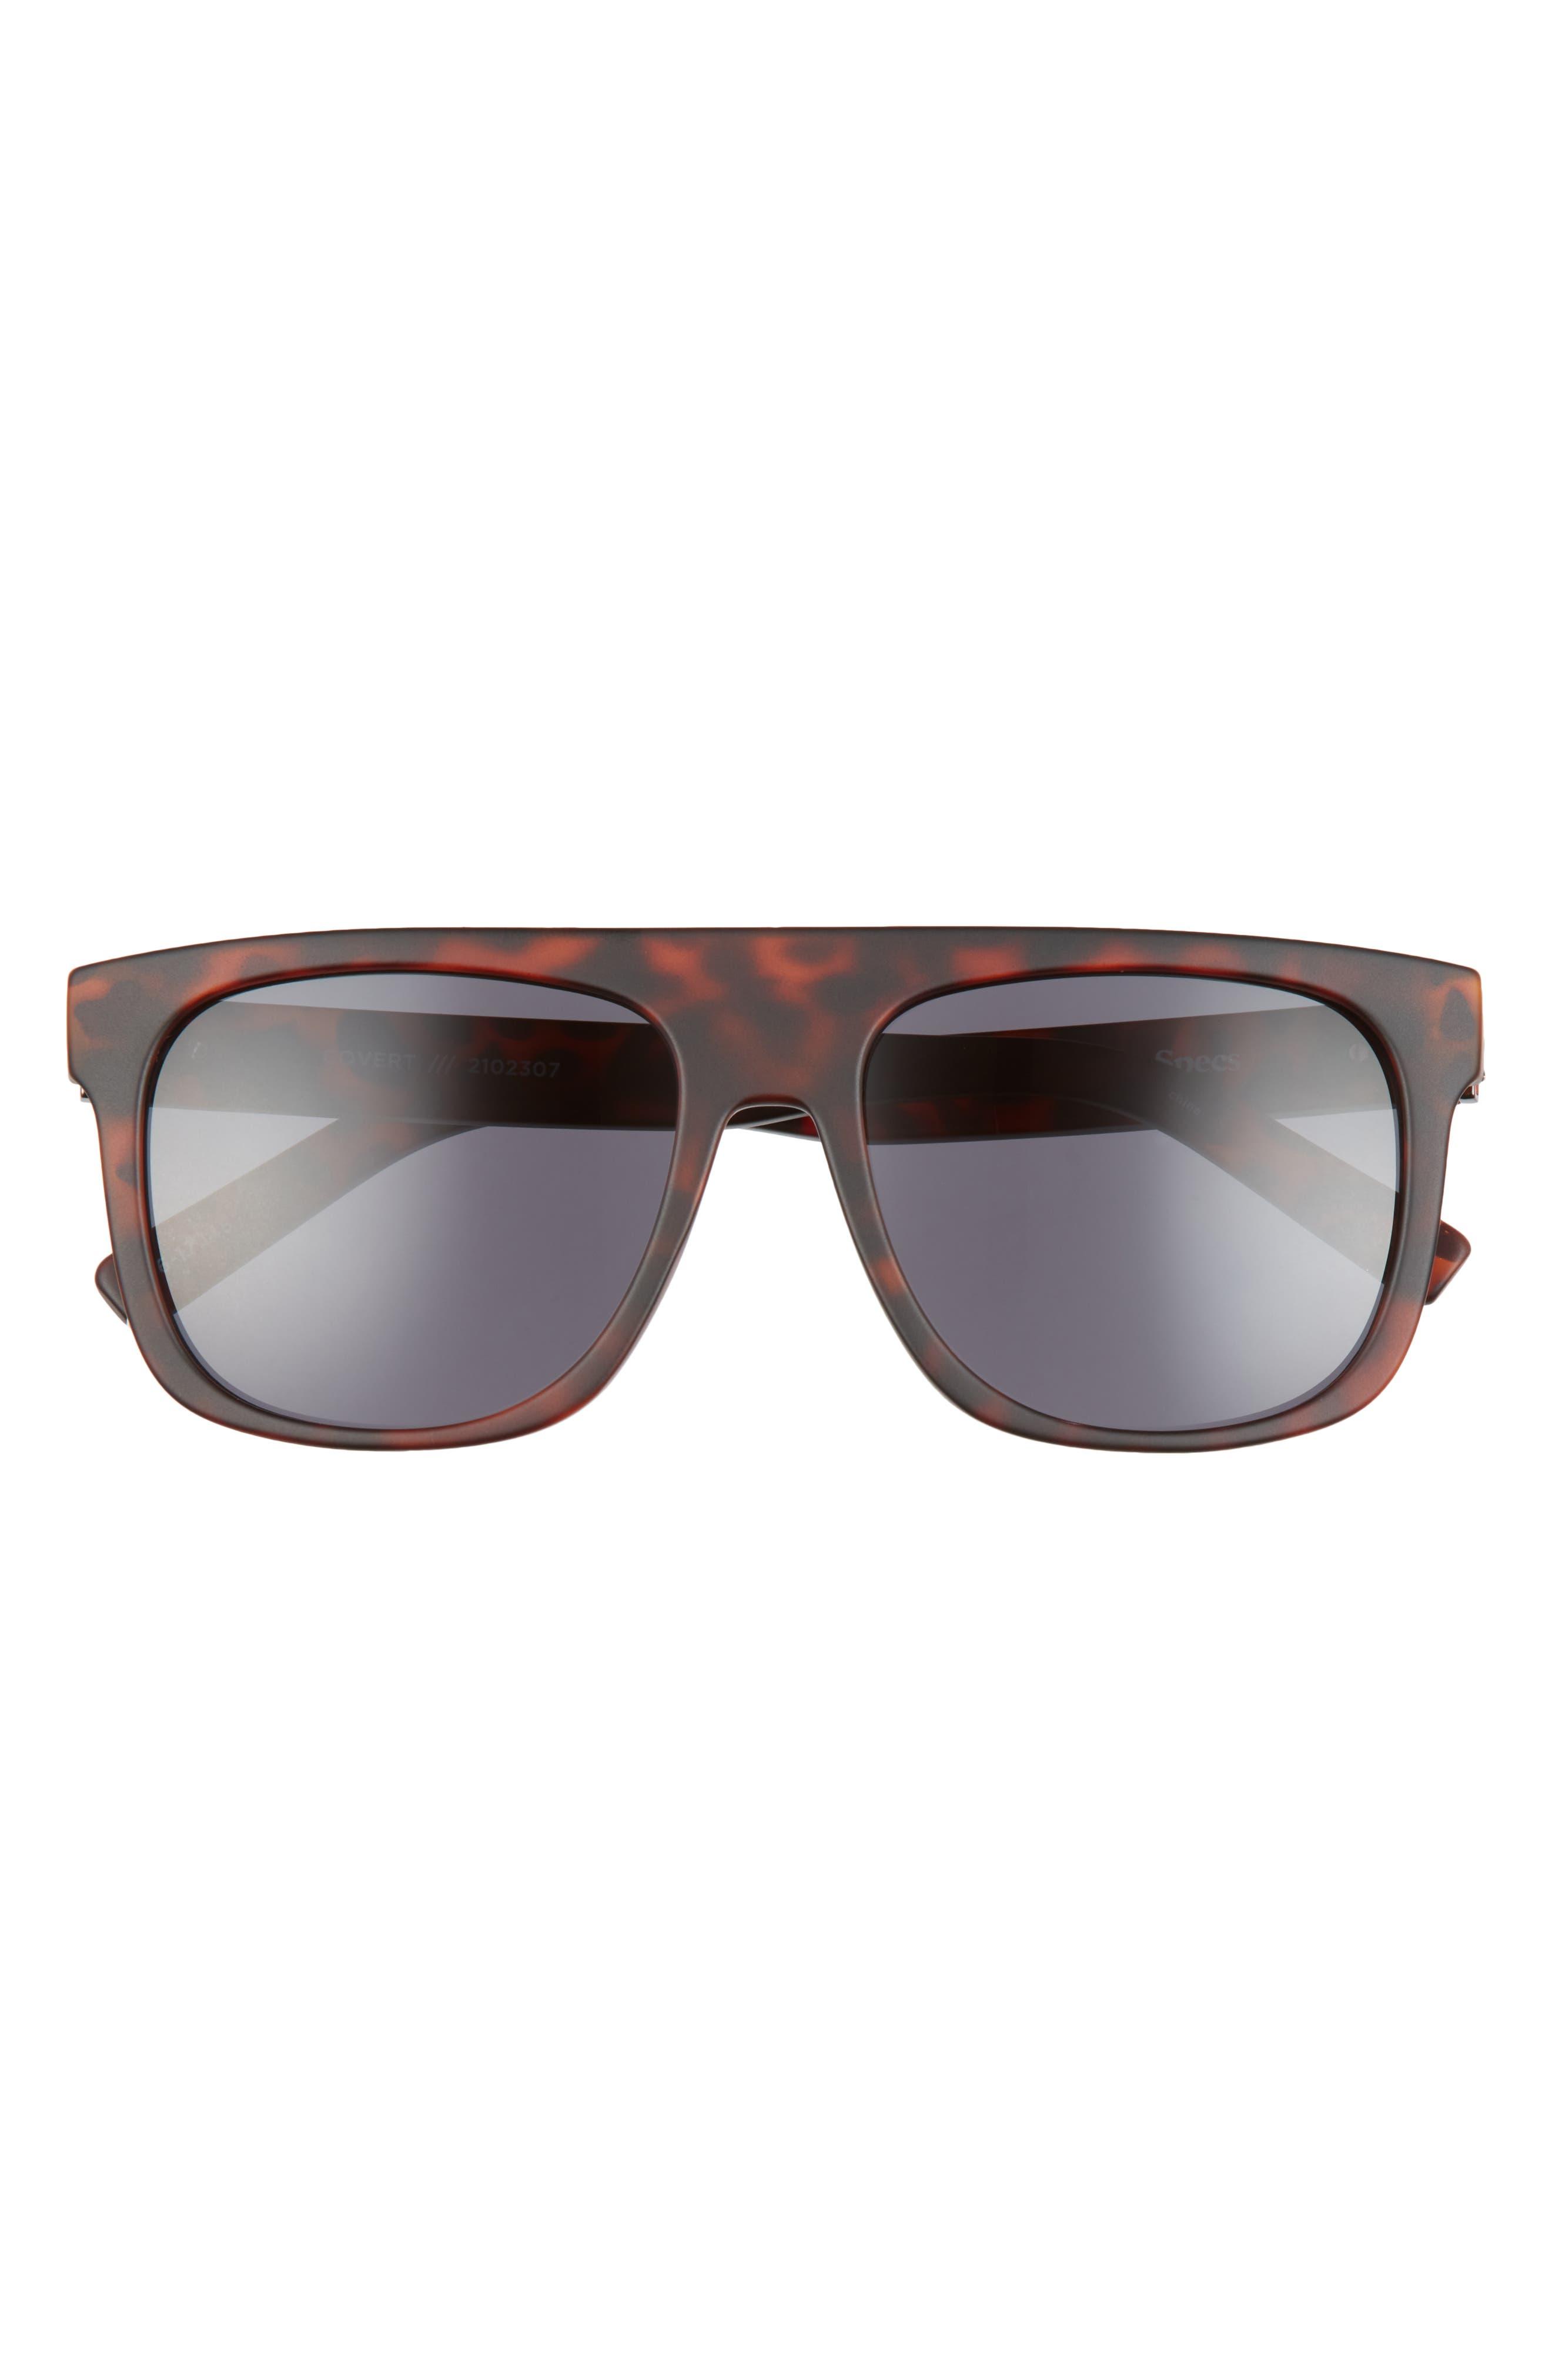 Covert Modern 56mm Polarized Flat Top Sunglasses